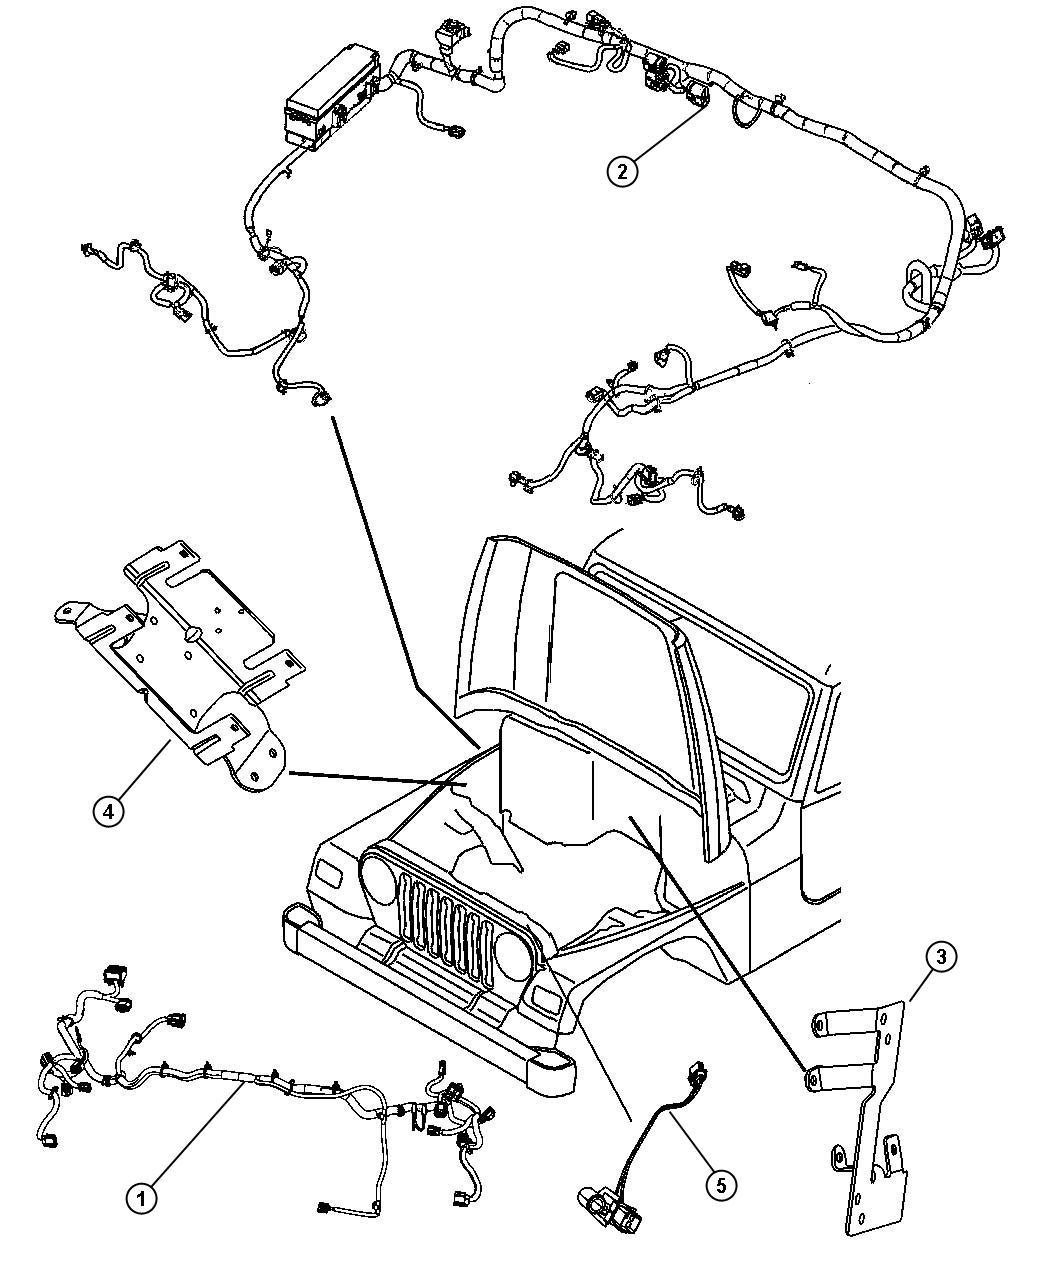 68054958AB - Jeep Wiring. Dash. Automatic transmission ...